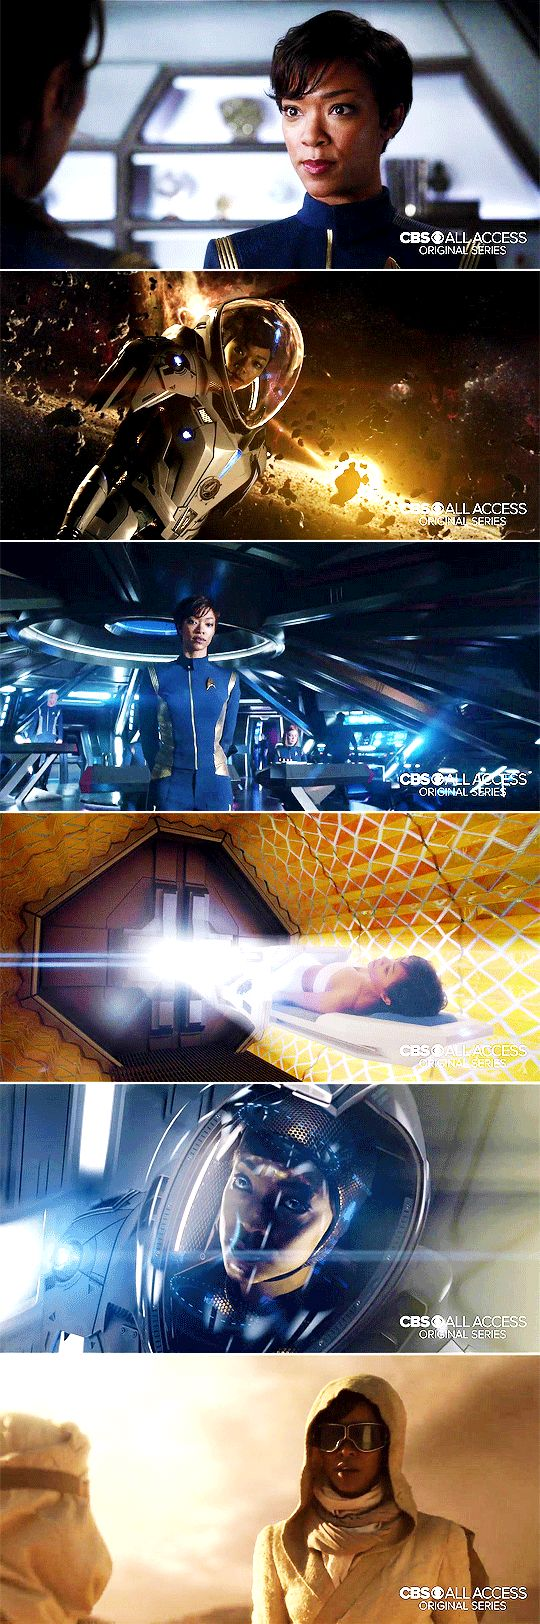 Sonequa Martin-Green as Michael Burnham in the Star Trek: Discovery Trailer